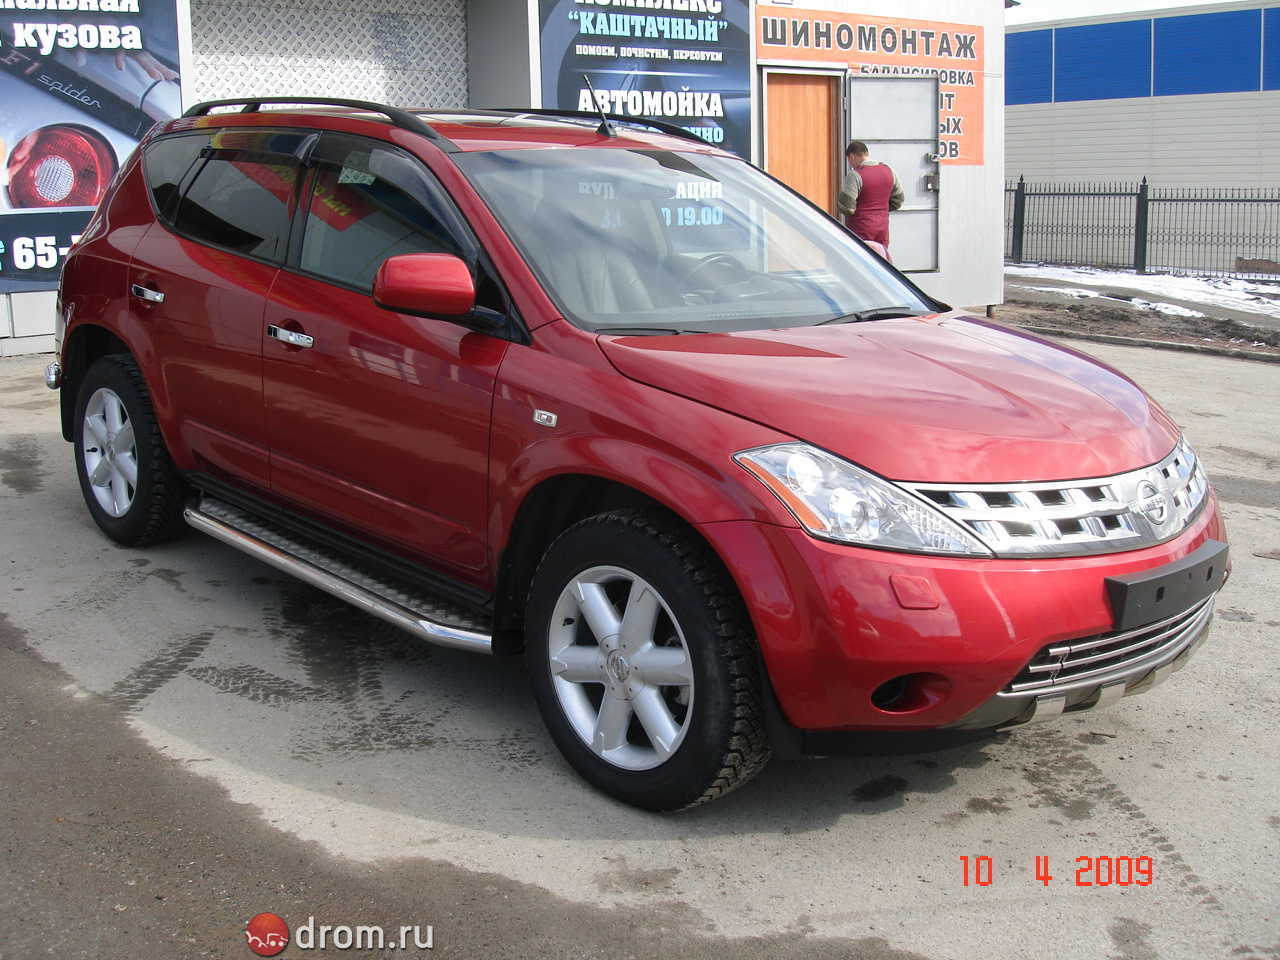 2008 Nissan Murano Pictures 3 5l Gasoline Automatic